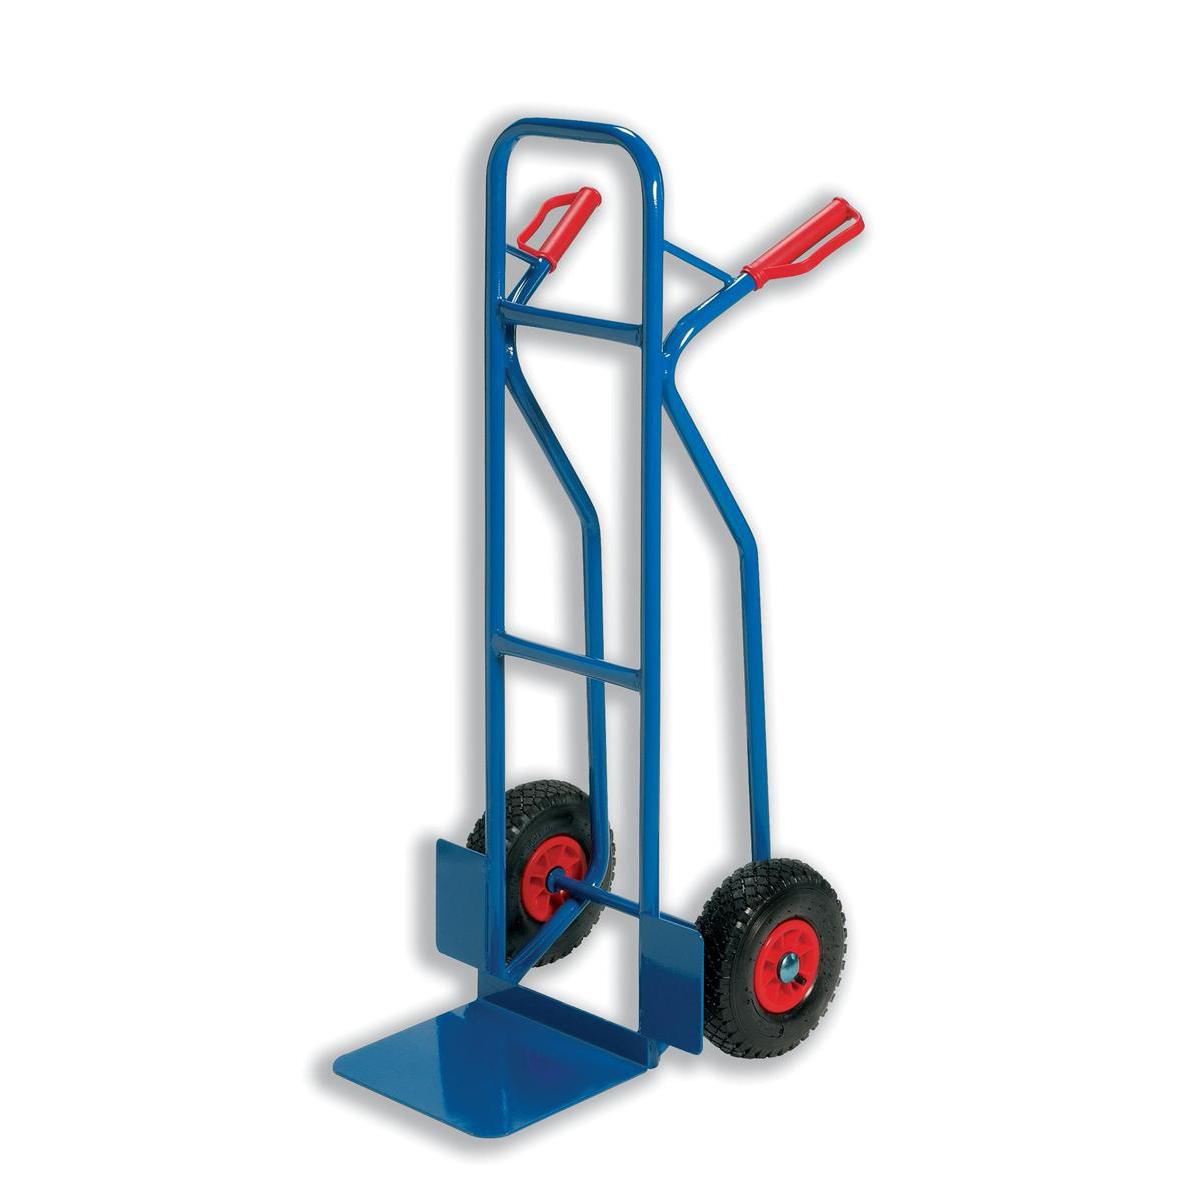 Sack Trucks Warehouse Hand Trolley Capacity 180kg Foot Size W495xL510mm Blue